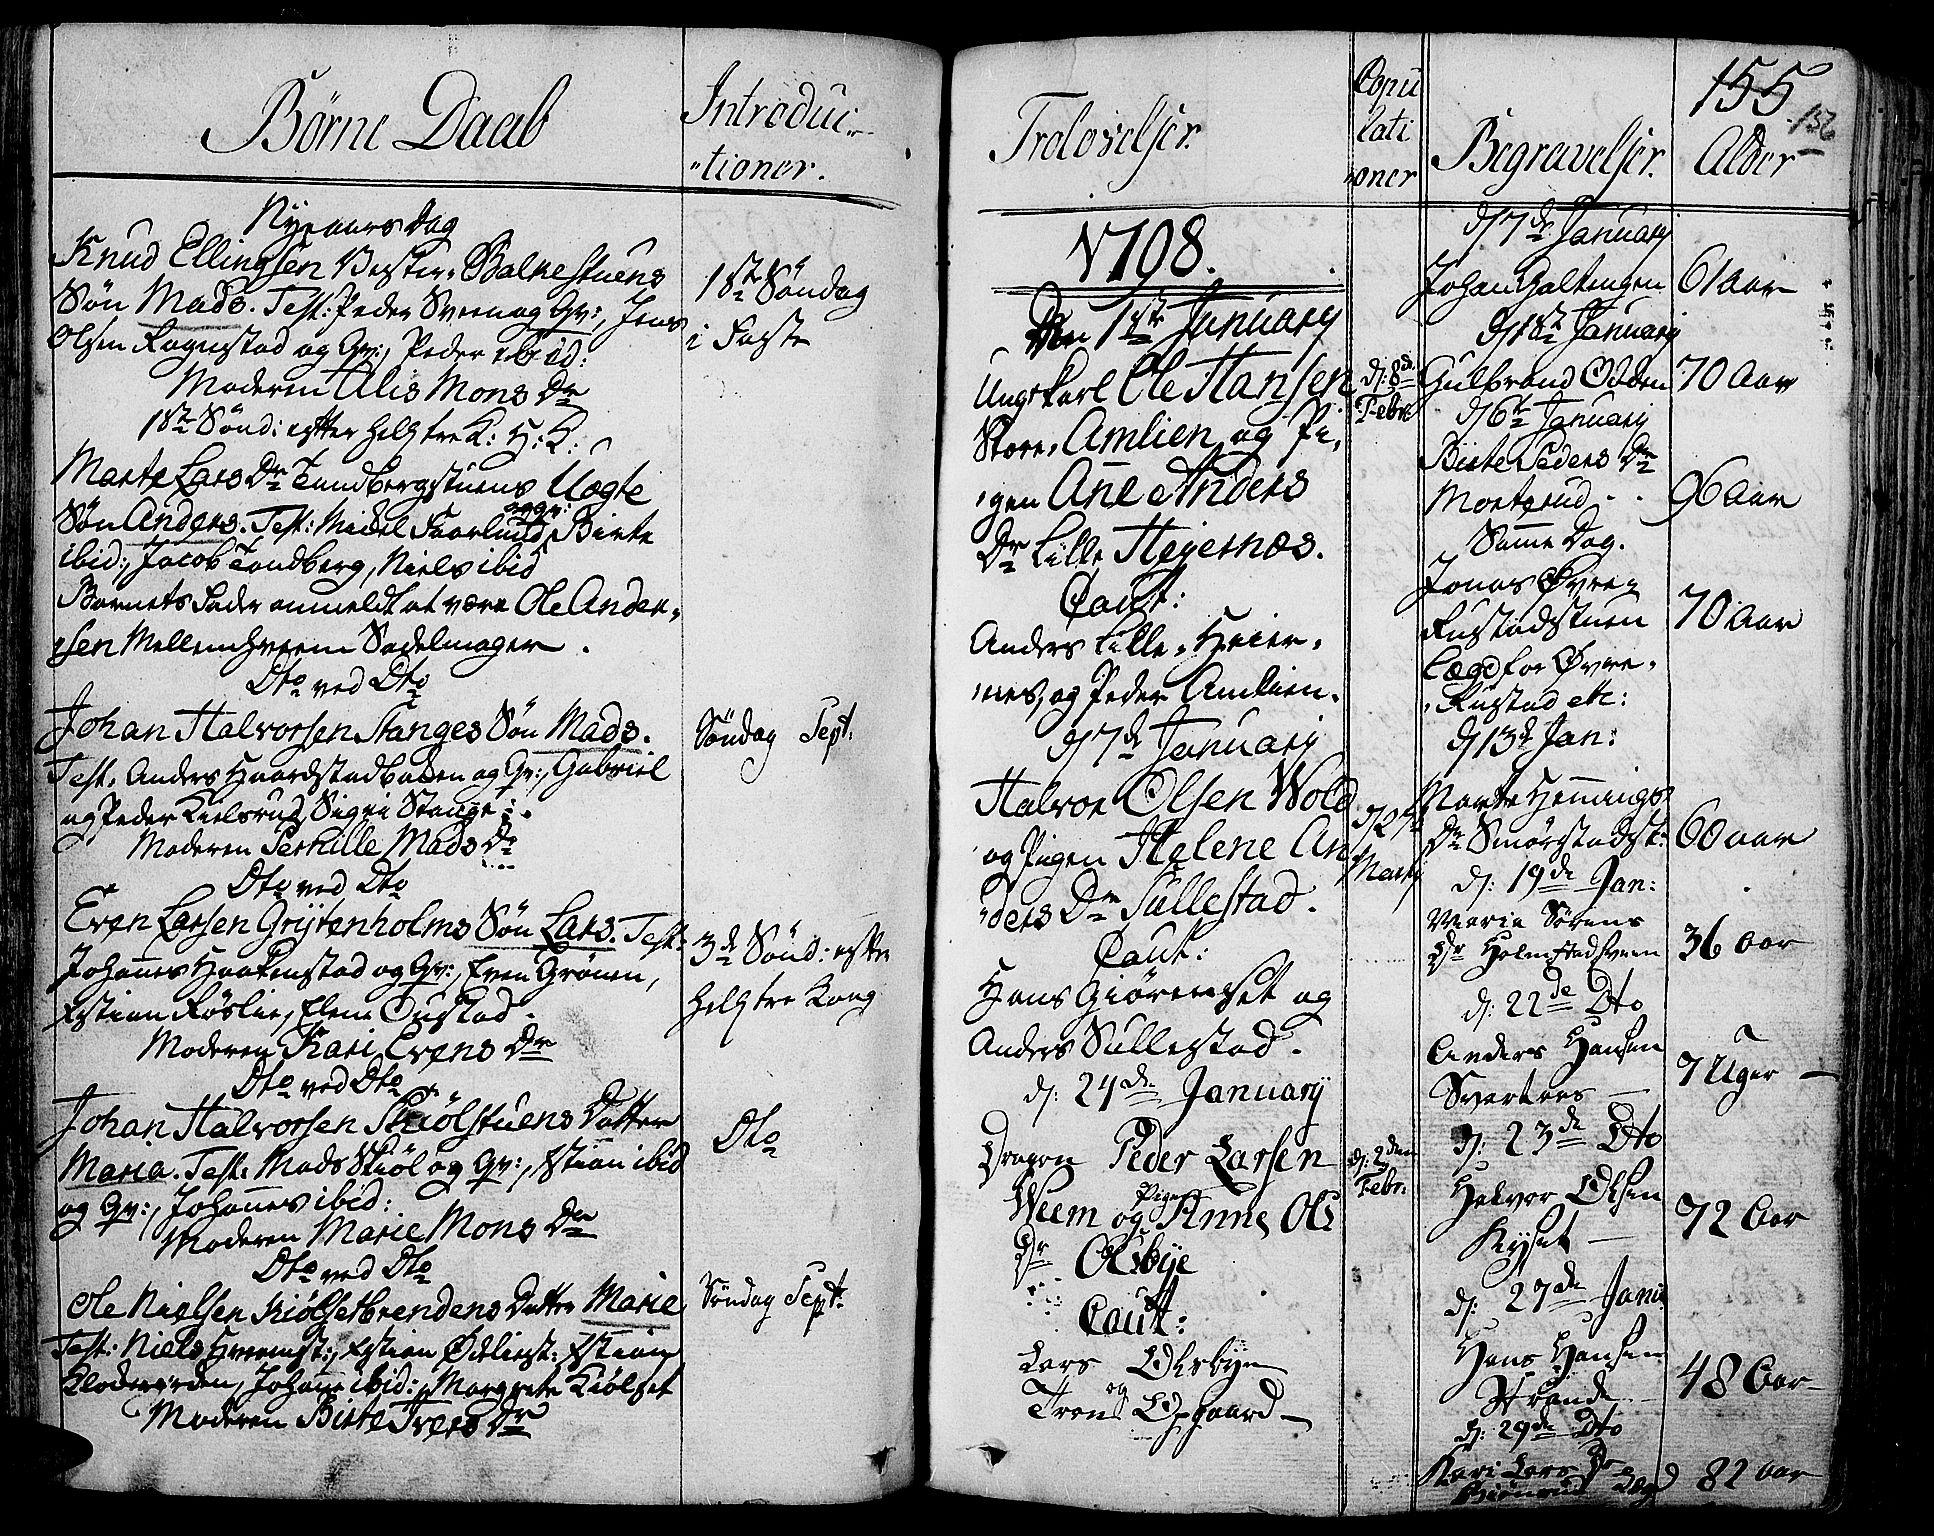 SAH, Toten prestekontor, Ministerialbok nr. 7, 1794-1809, s. 156